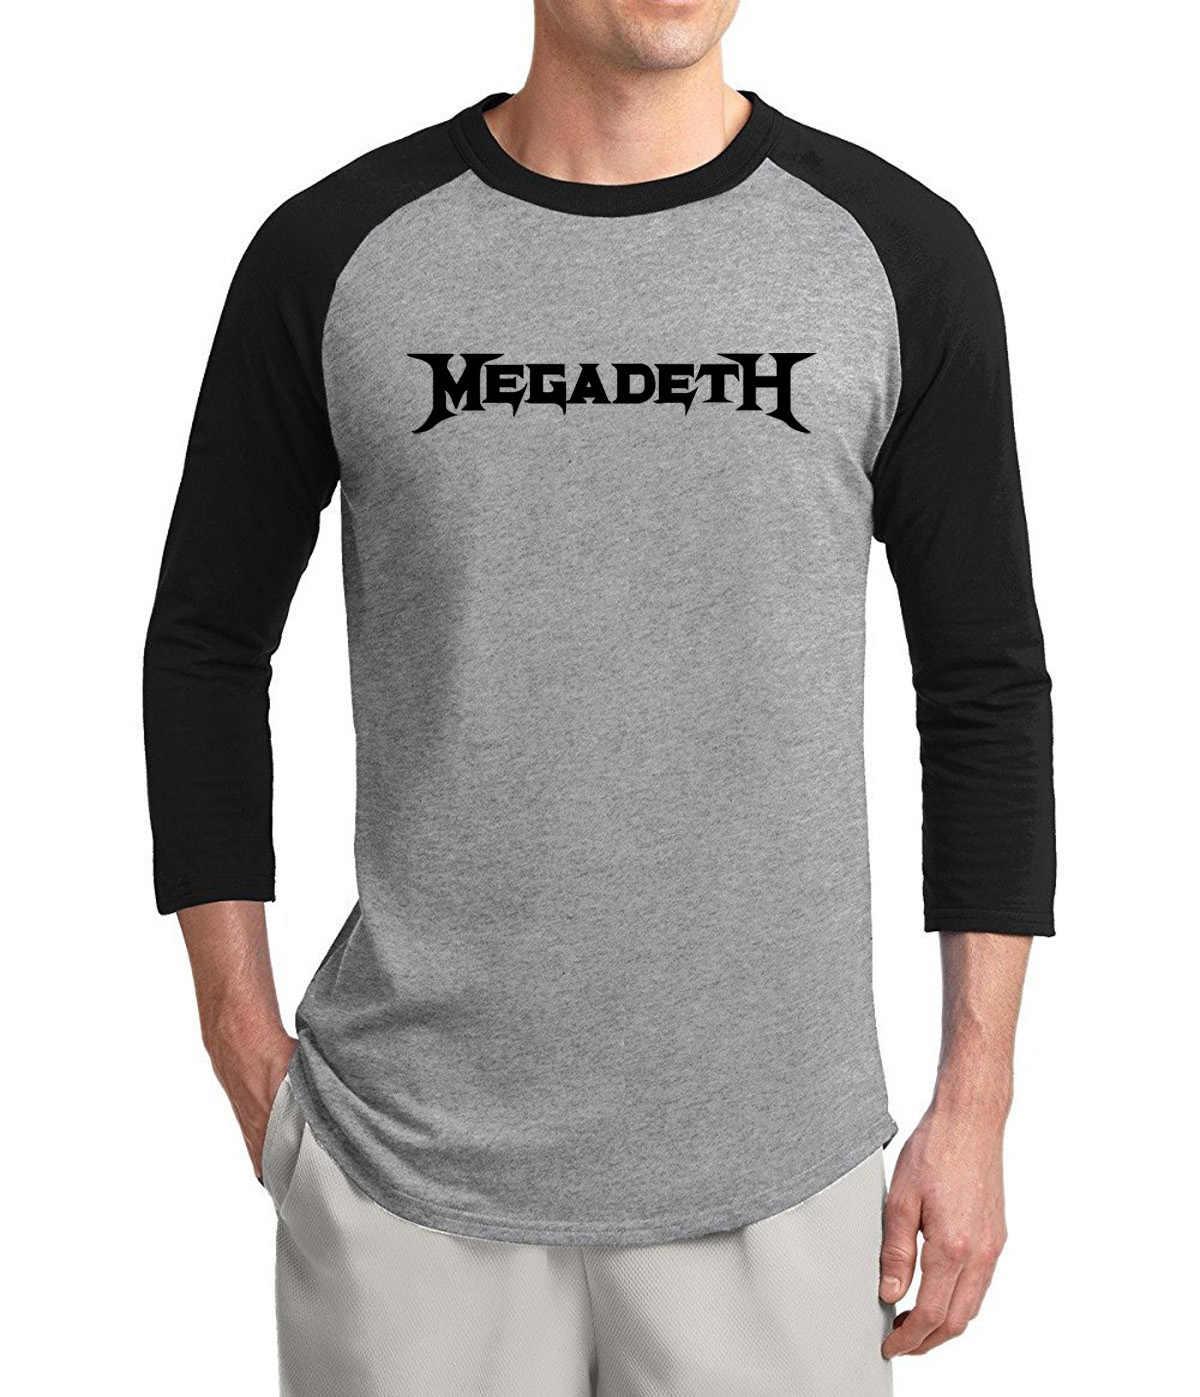 New Arrival Metal Band Megadeth 3/4 sleeve t shirt men 2017 summer 100% cotton fashion raglan men t-shirt hip hop o-neck tshirt